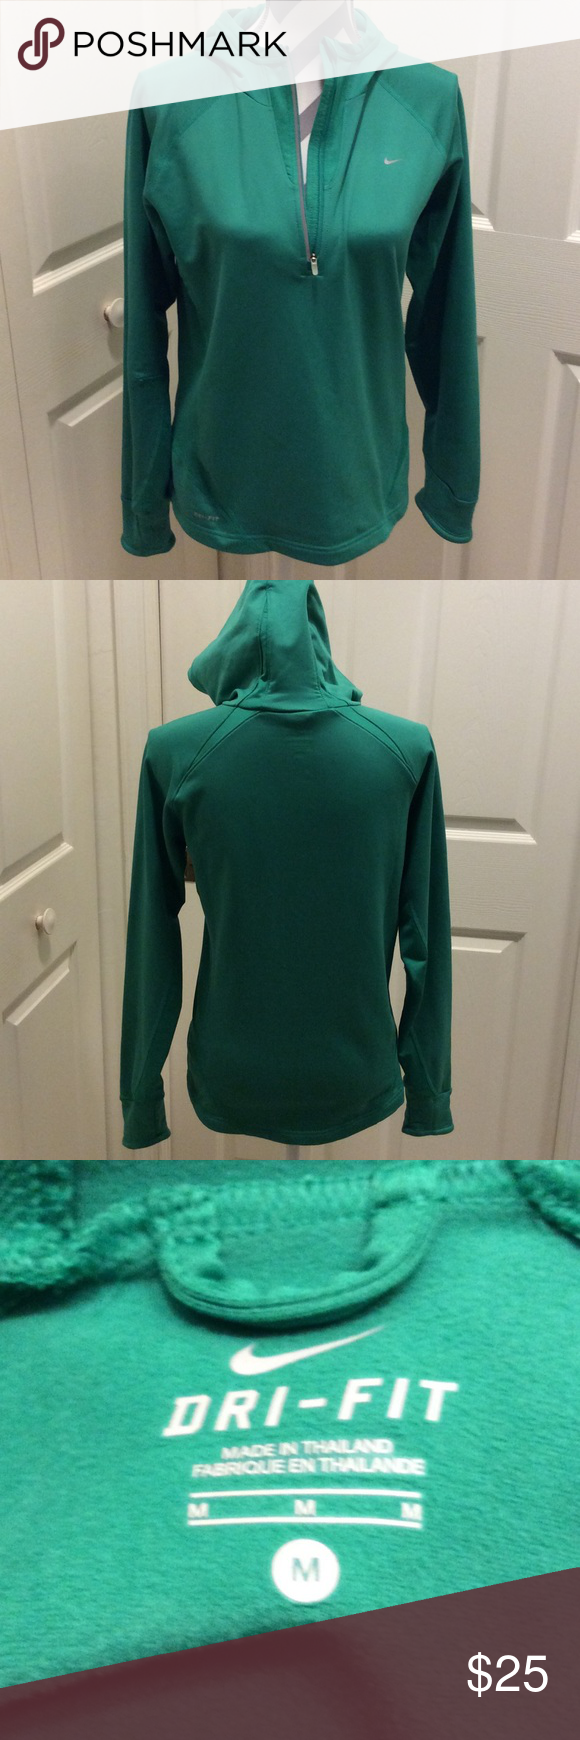 Nike Dri-Fit Hoodie Excellent used condition, worn once! Nike Tops Sweatshirts & Hoodies